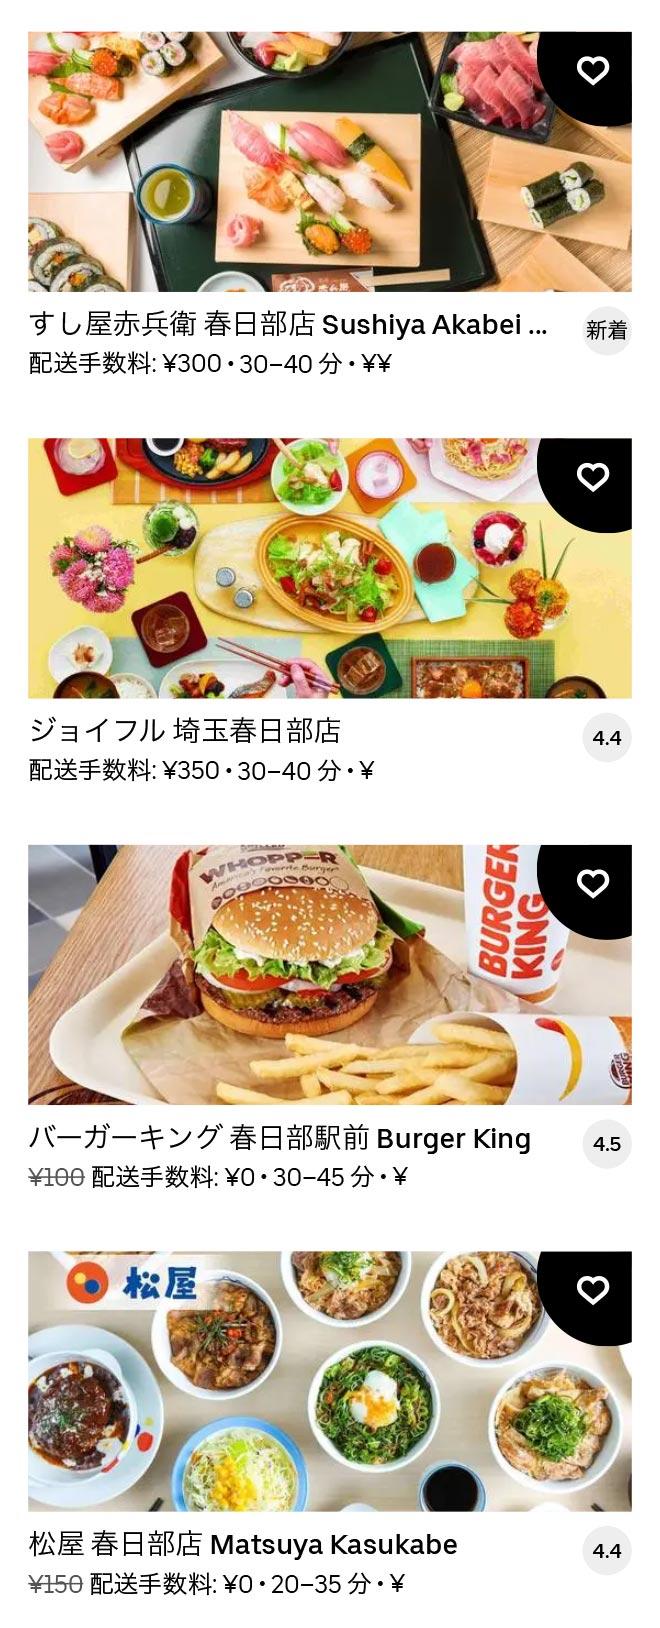 Kasukabe menu 2101 11